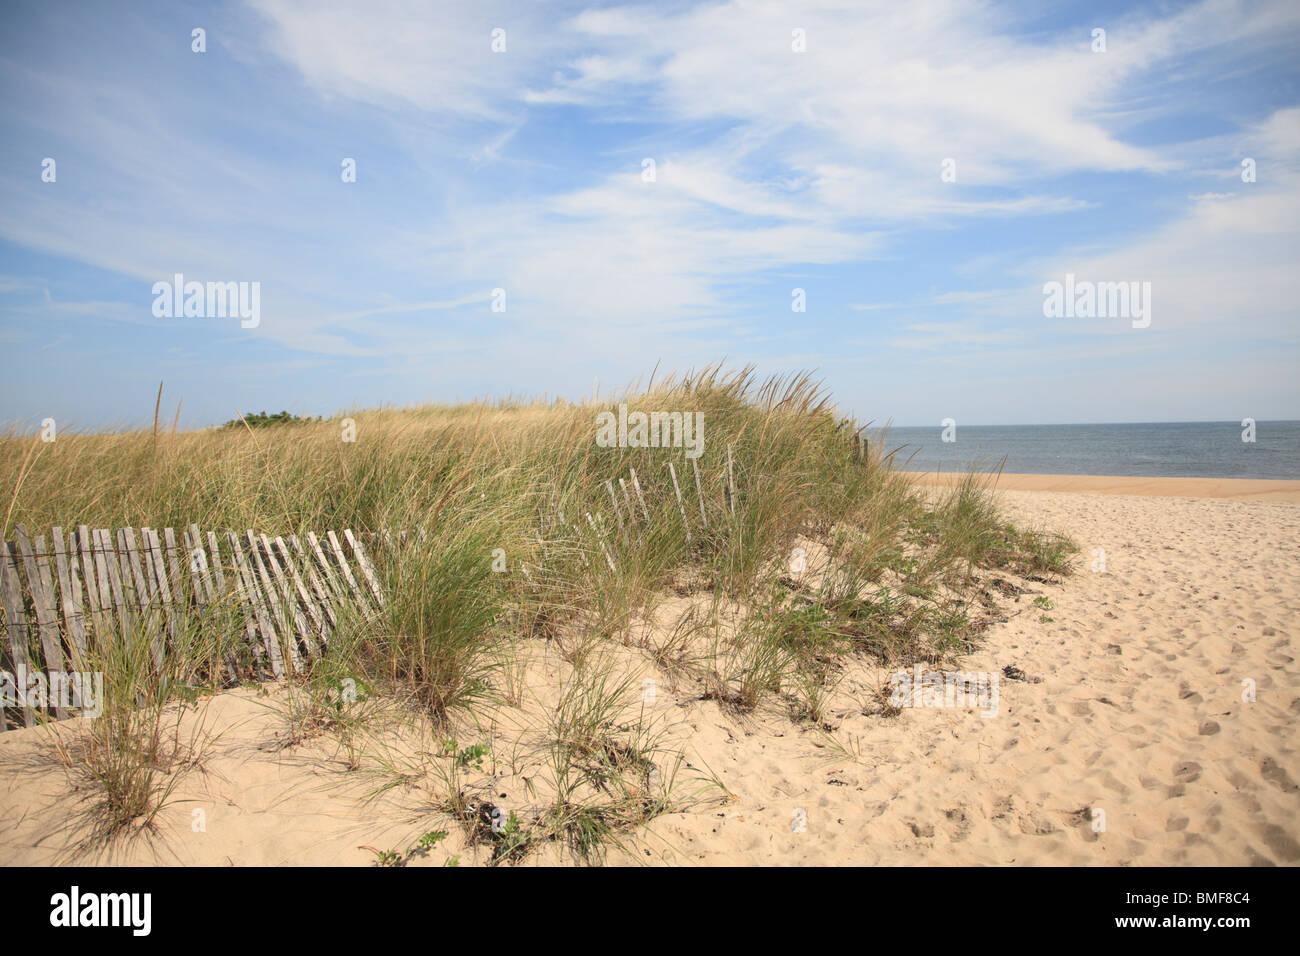 Egypt Beach East Hampton The Hamptons Long Island New York Usa Stock Photo Alamy